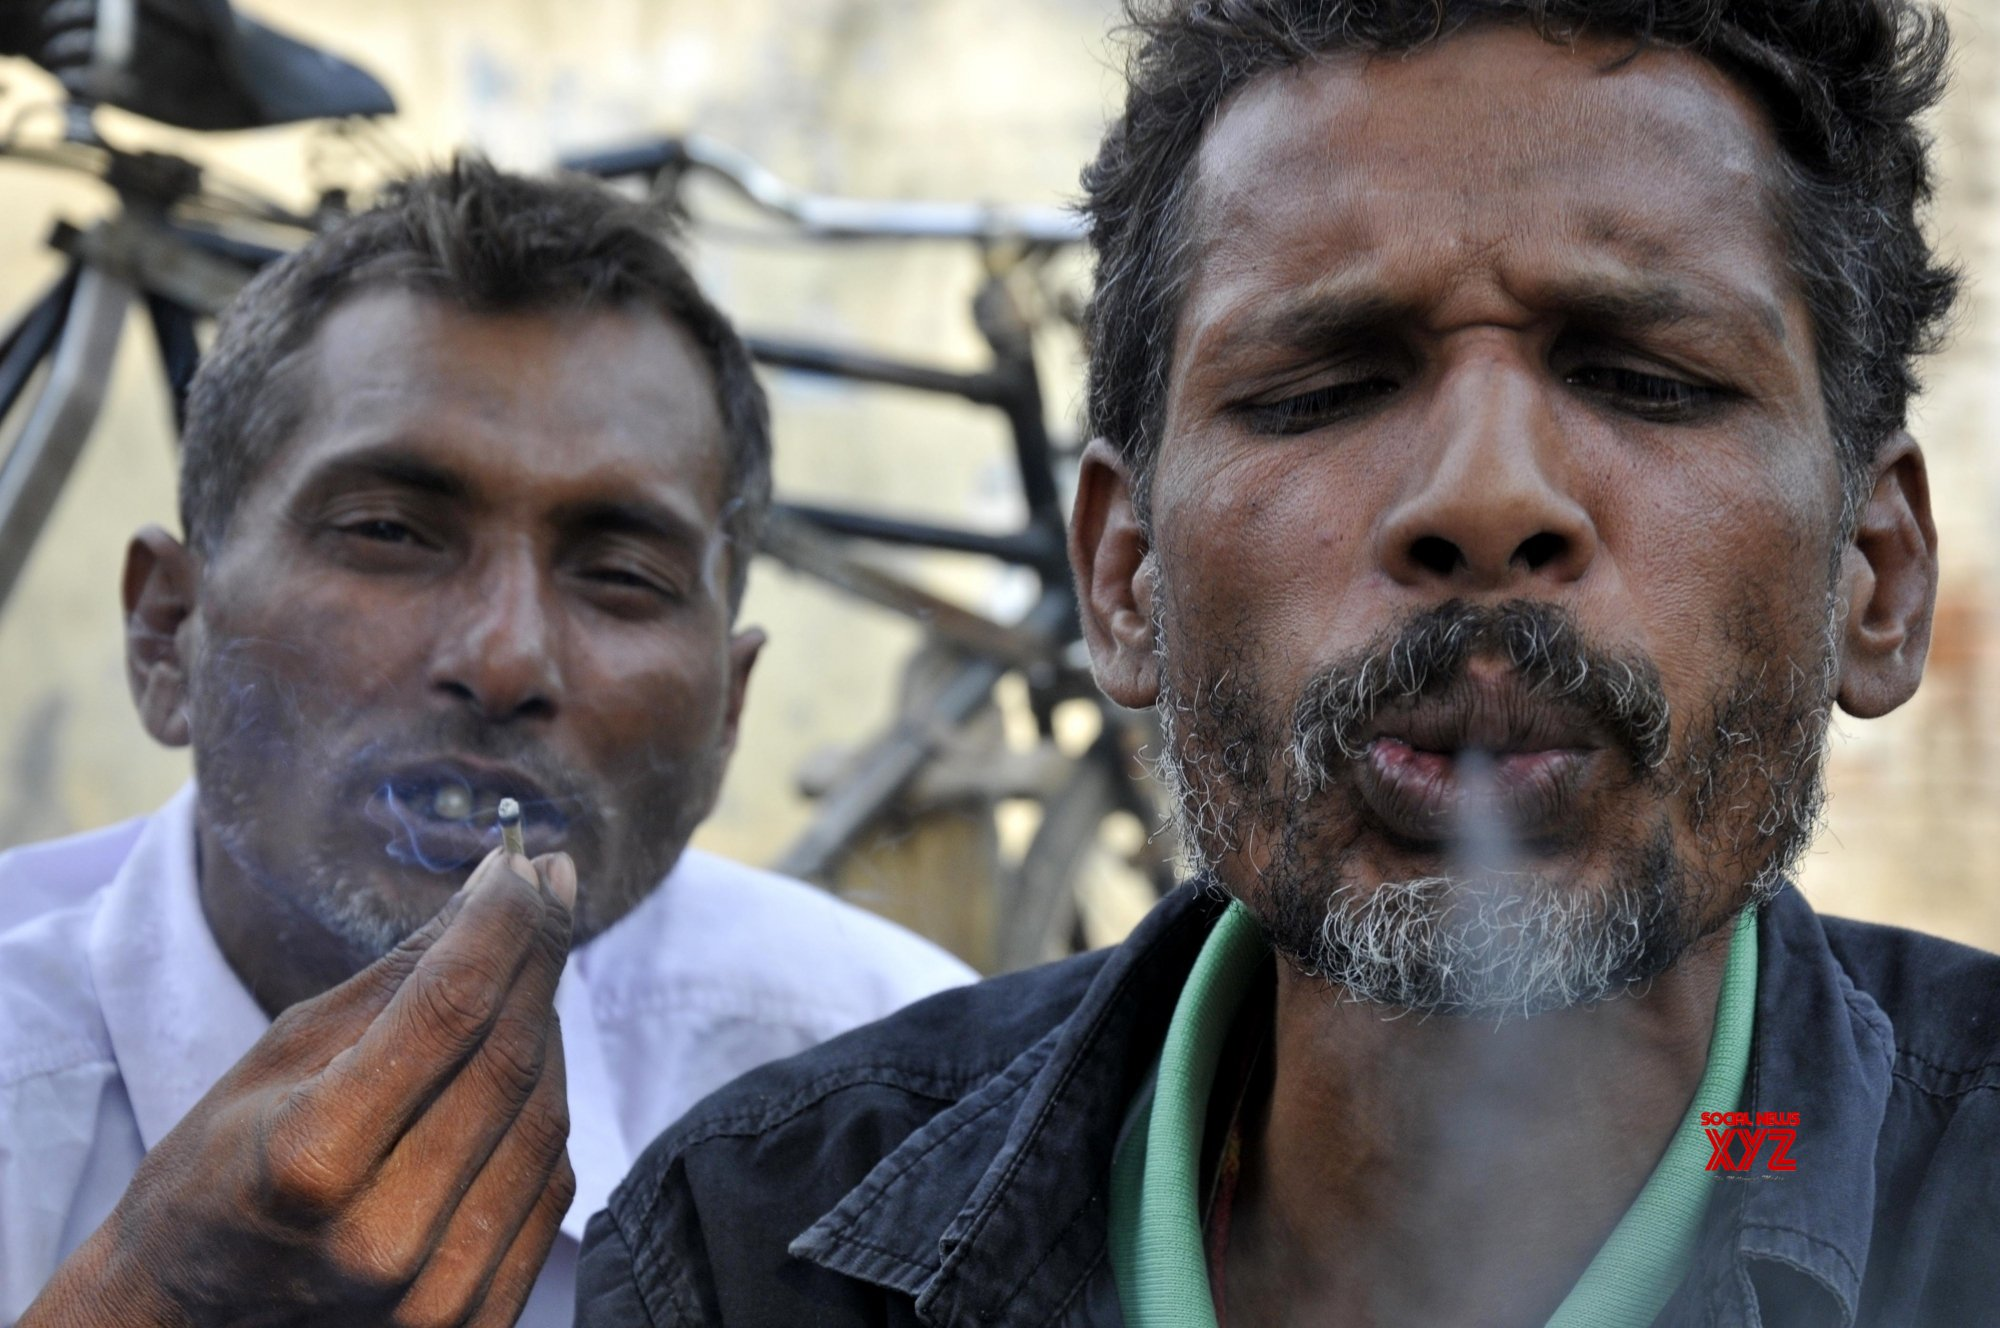 Passive smoking can raise kidney disease risk